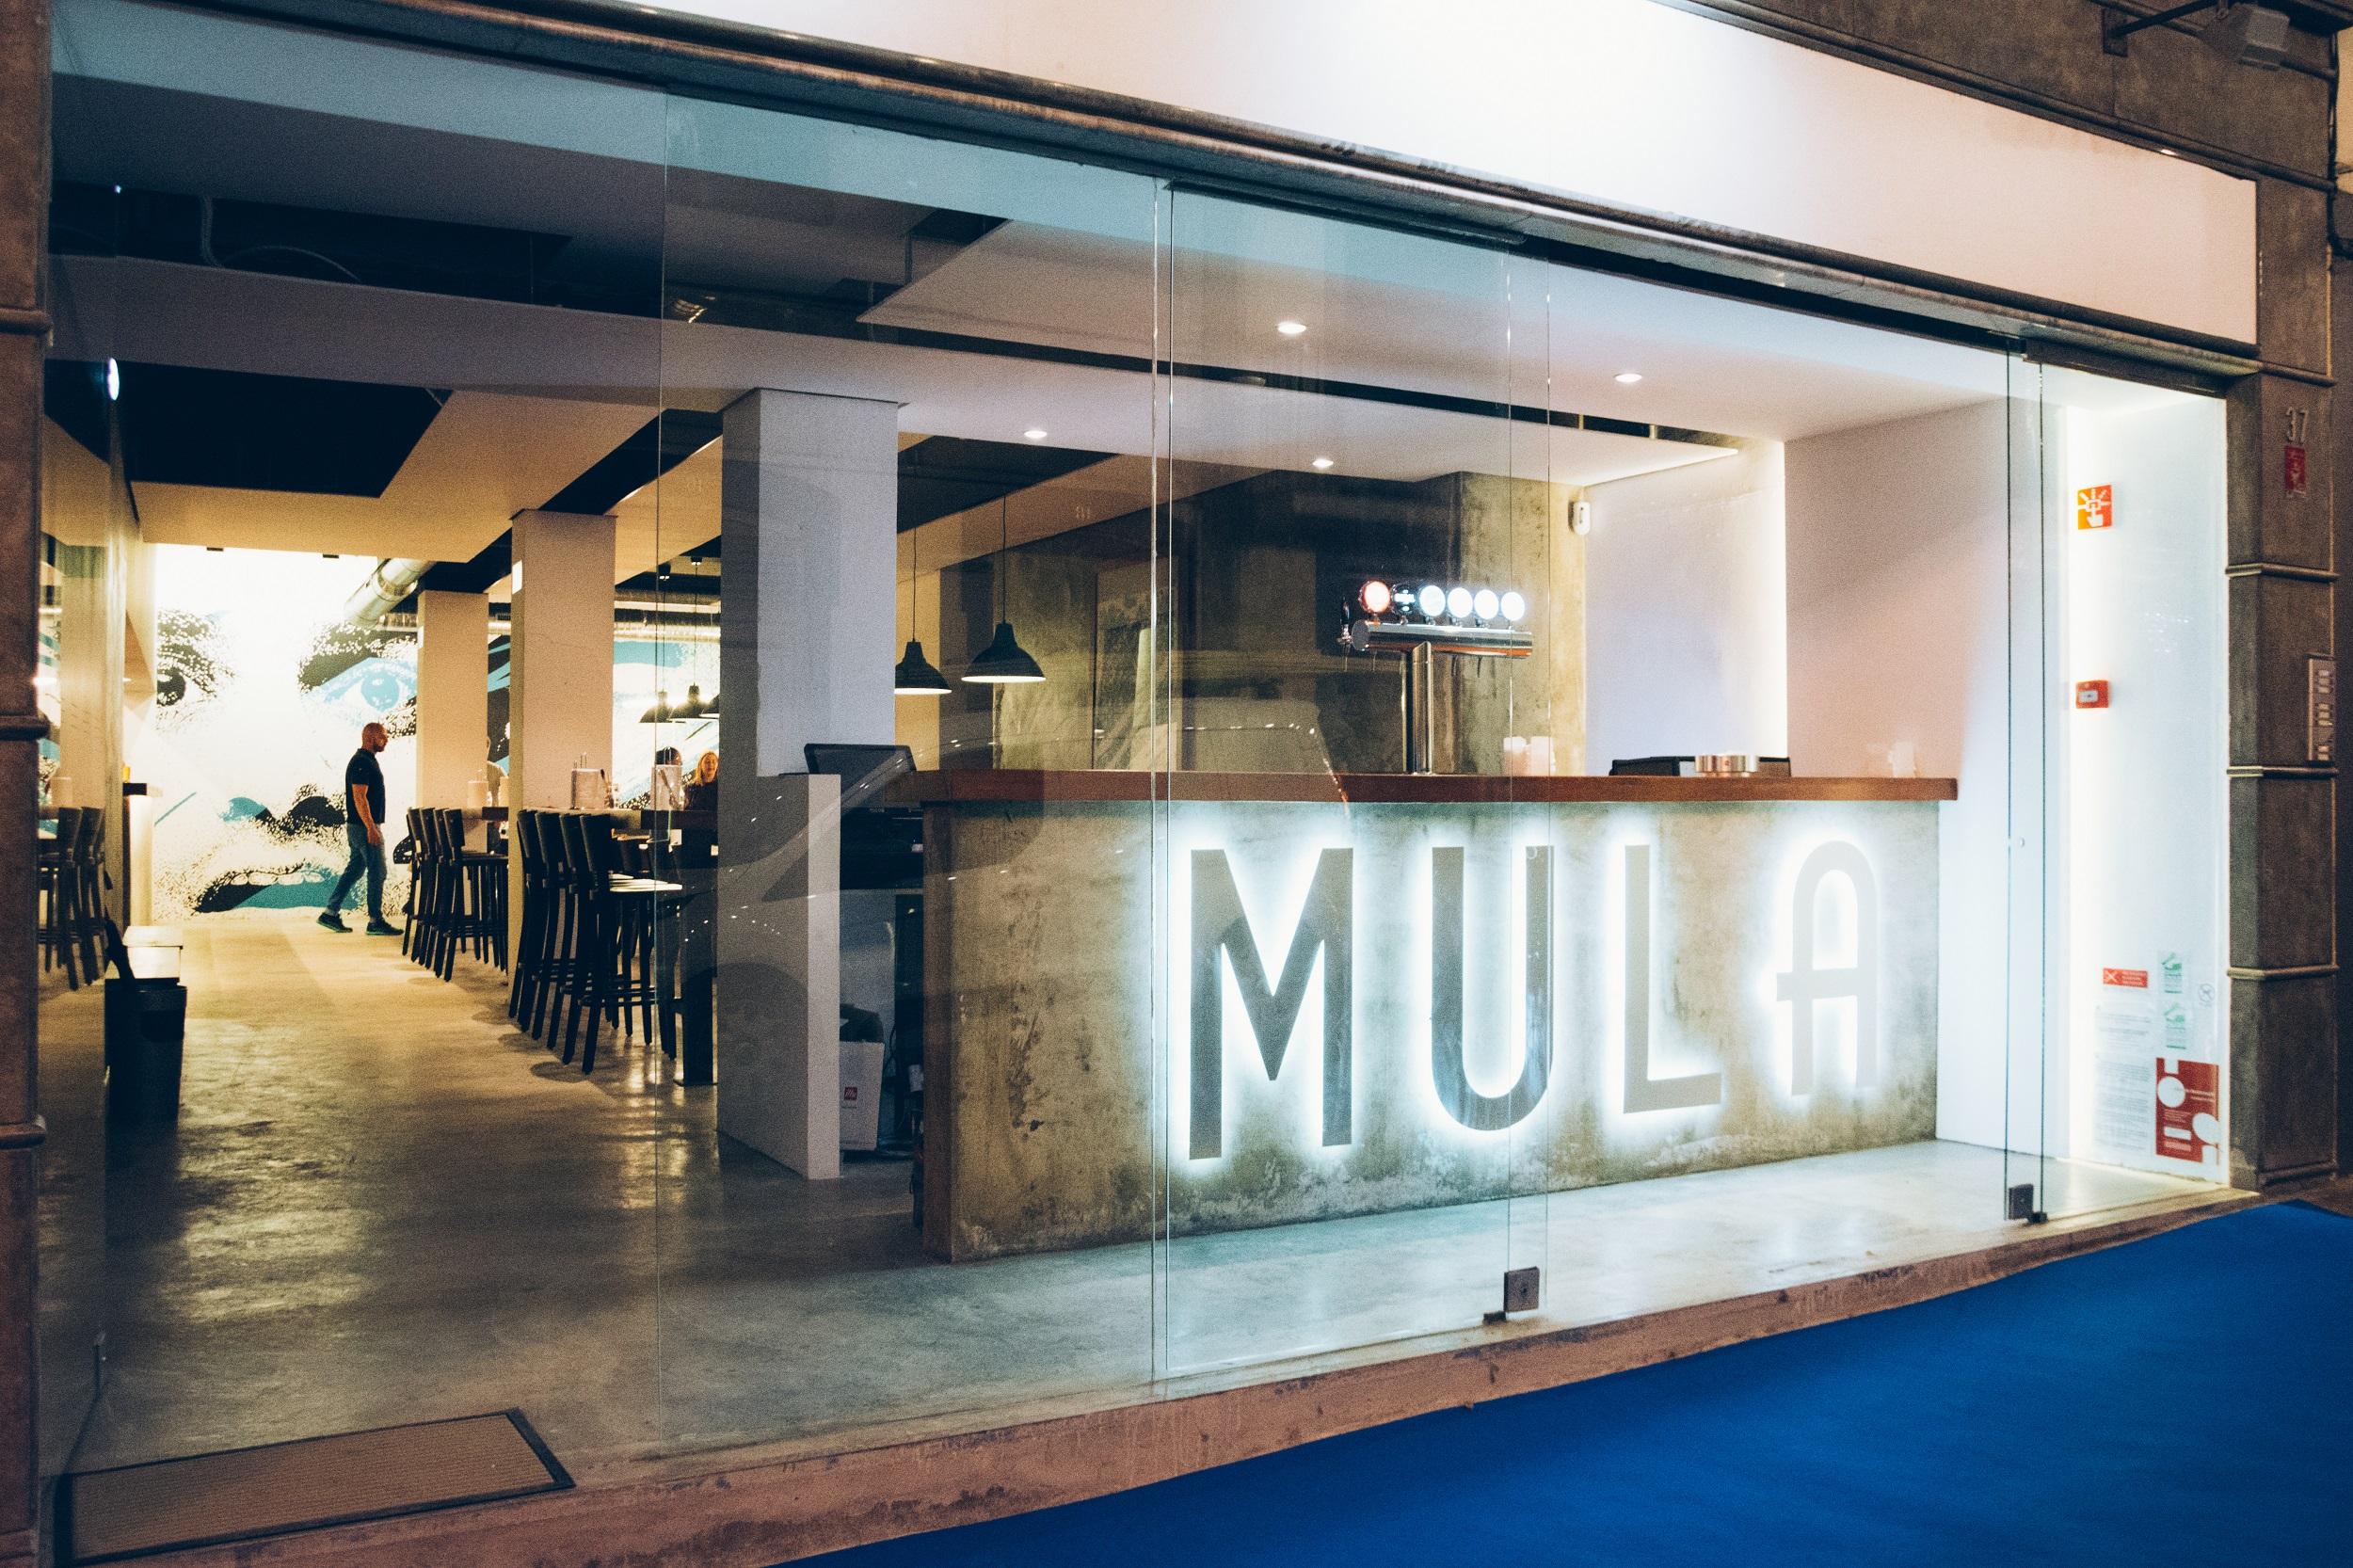 Photo shooting for MULA restaurant By Benjamin BEGIN